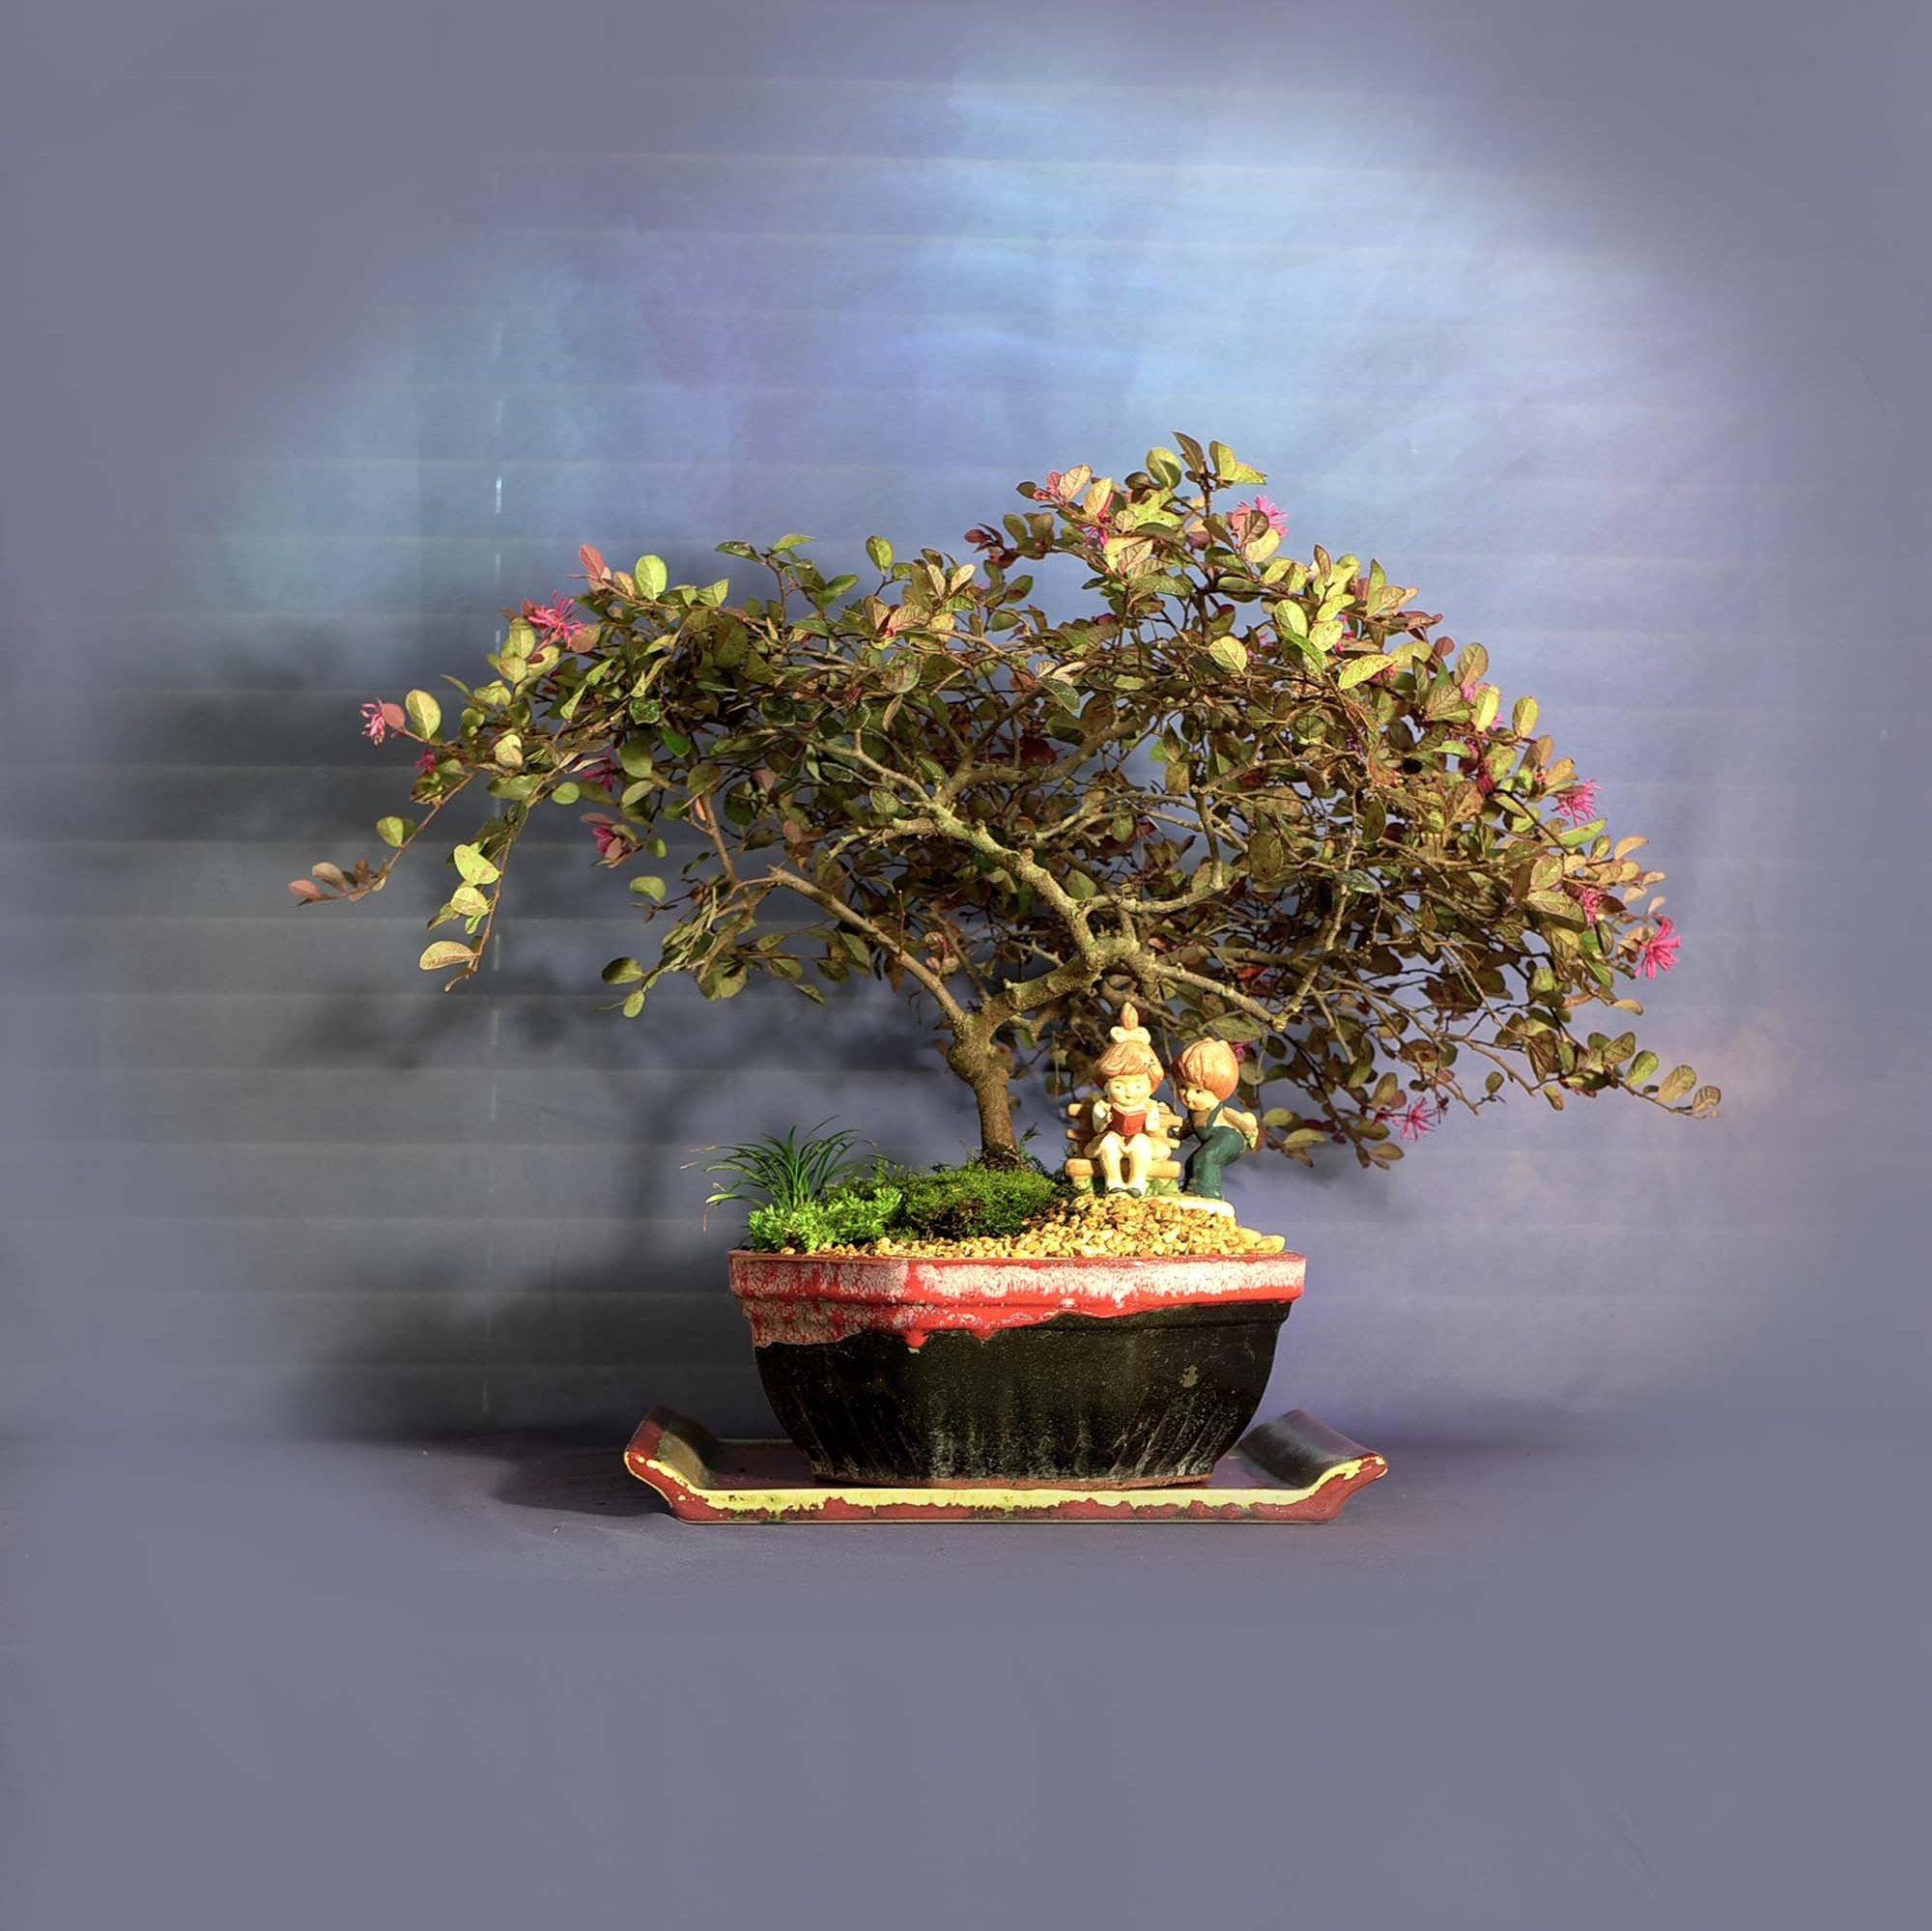 Loropetalum Bonsai Tree Tropical Bloom Collection From Livebonsaitree By Livebonsaitree On Etsy In 2020 Bonsai Tree Bonsai Nursery Pre Bonsai